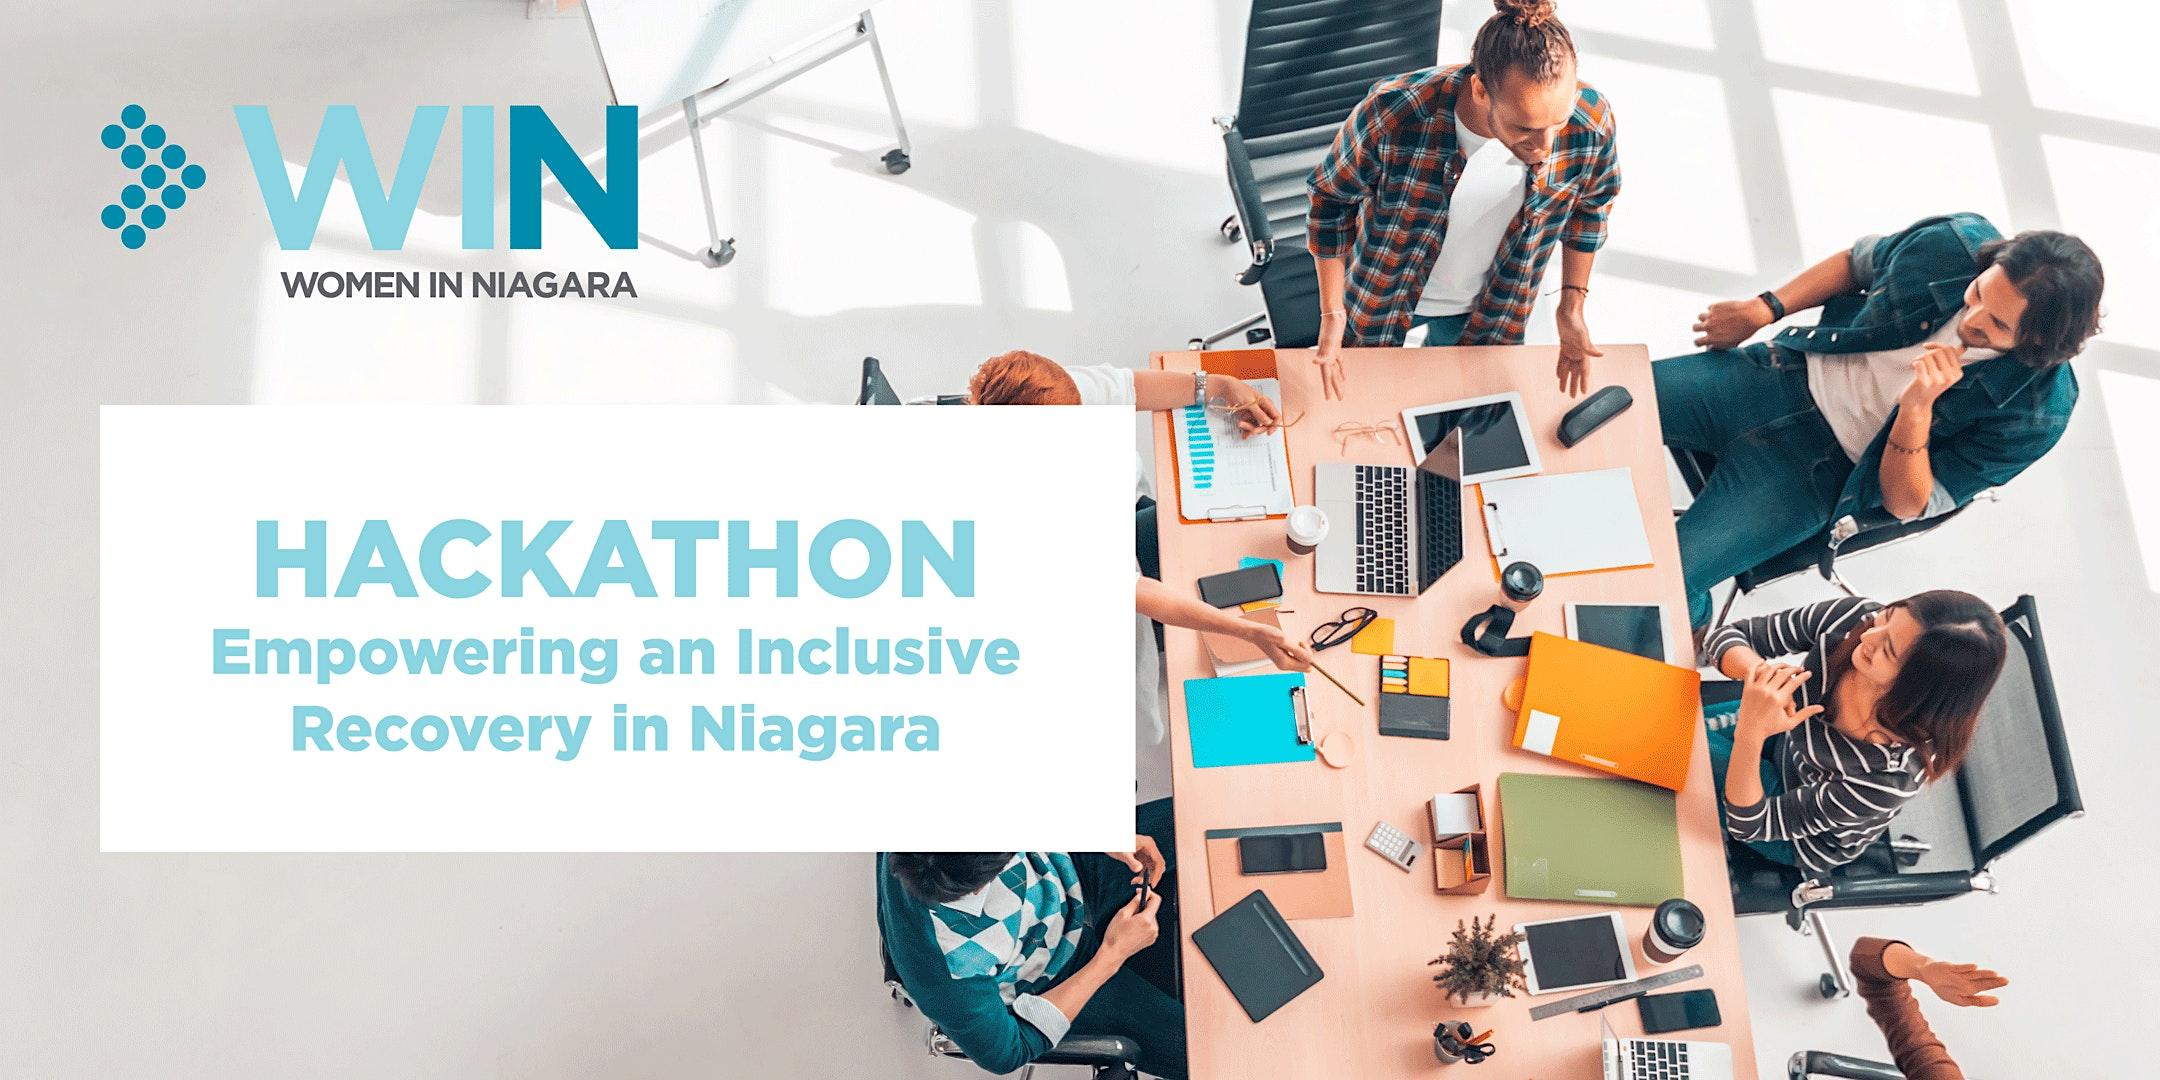 Women in Niagara Presents: The Hackathon